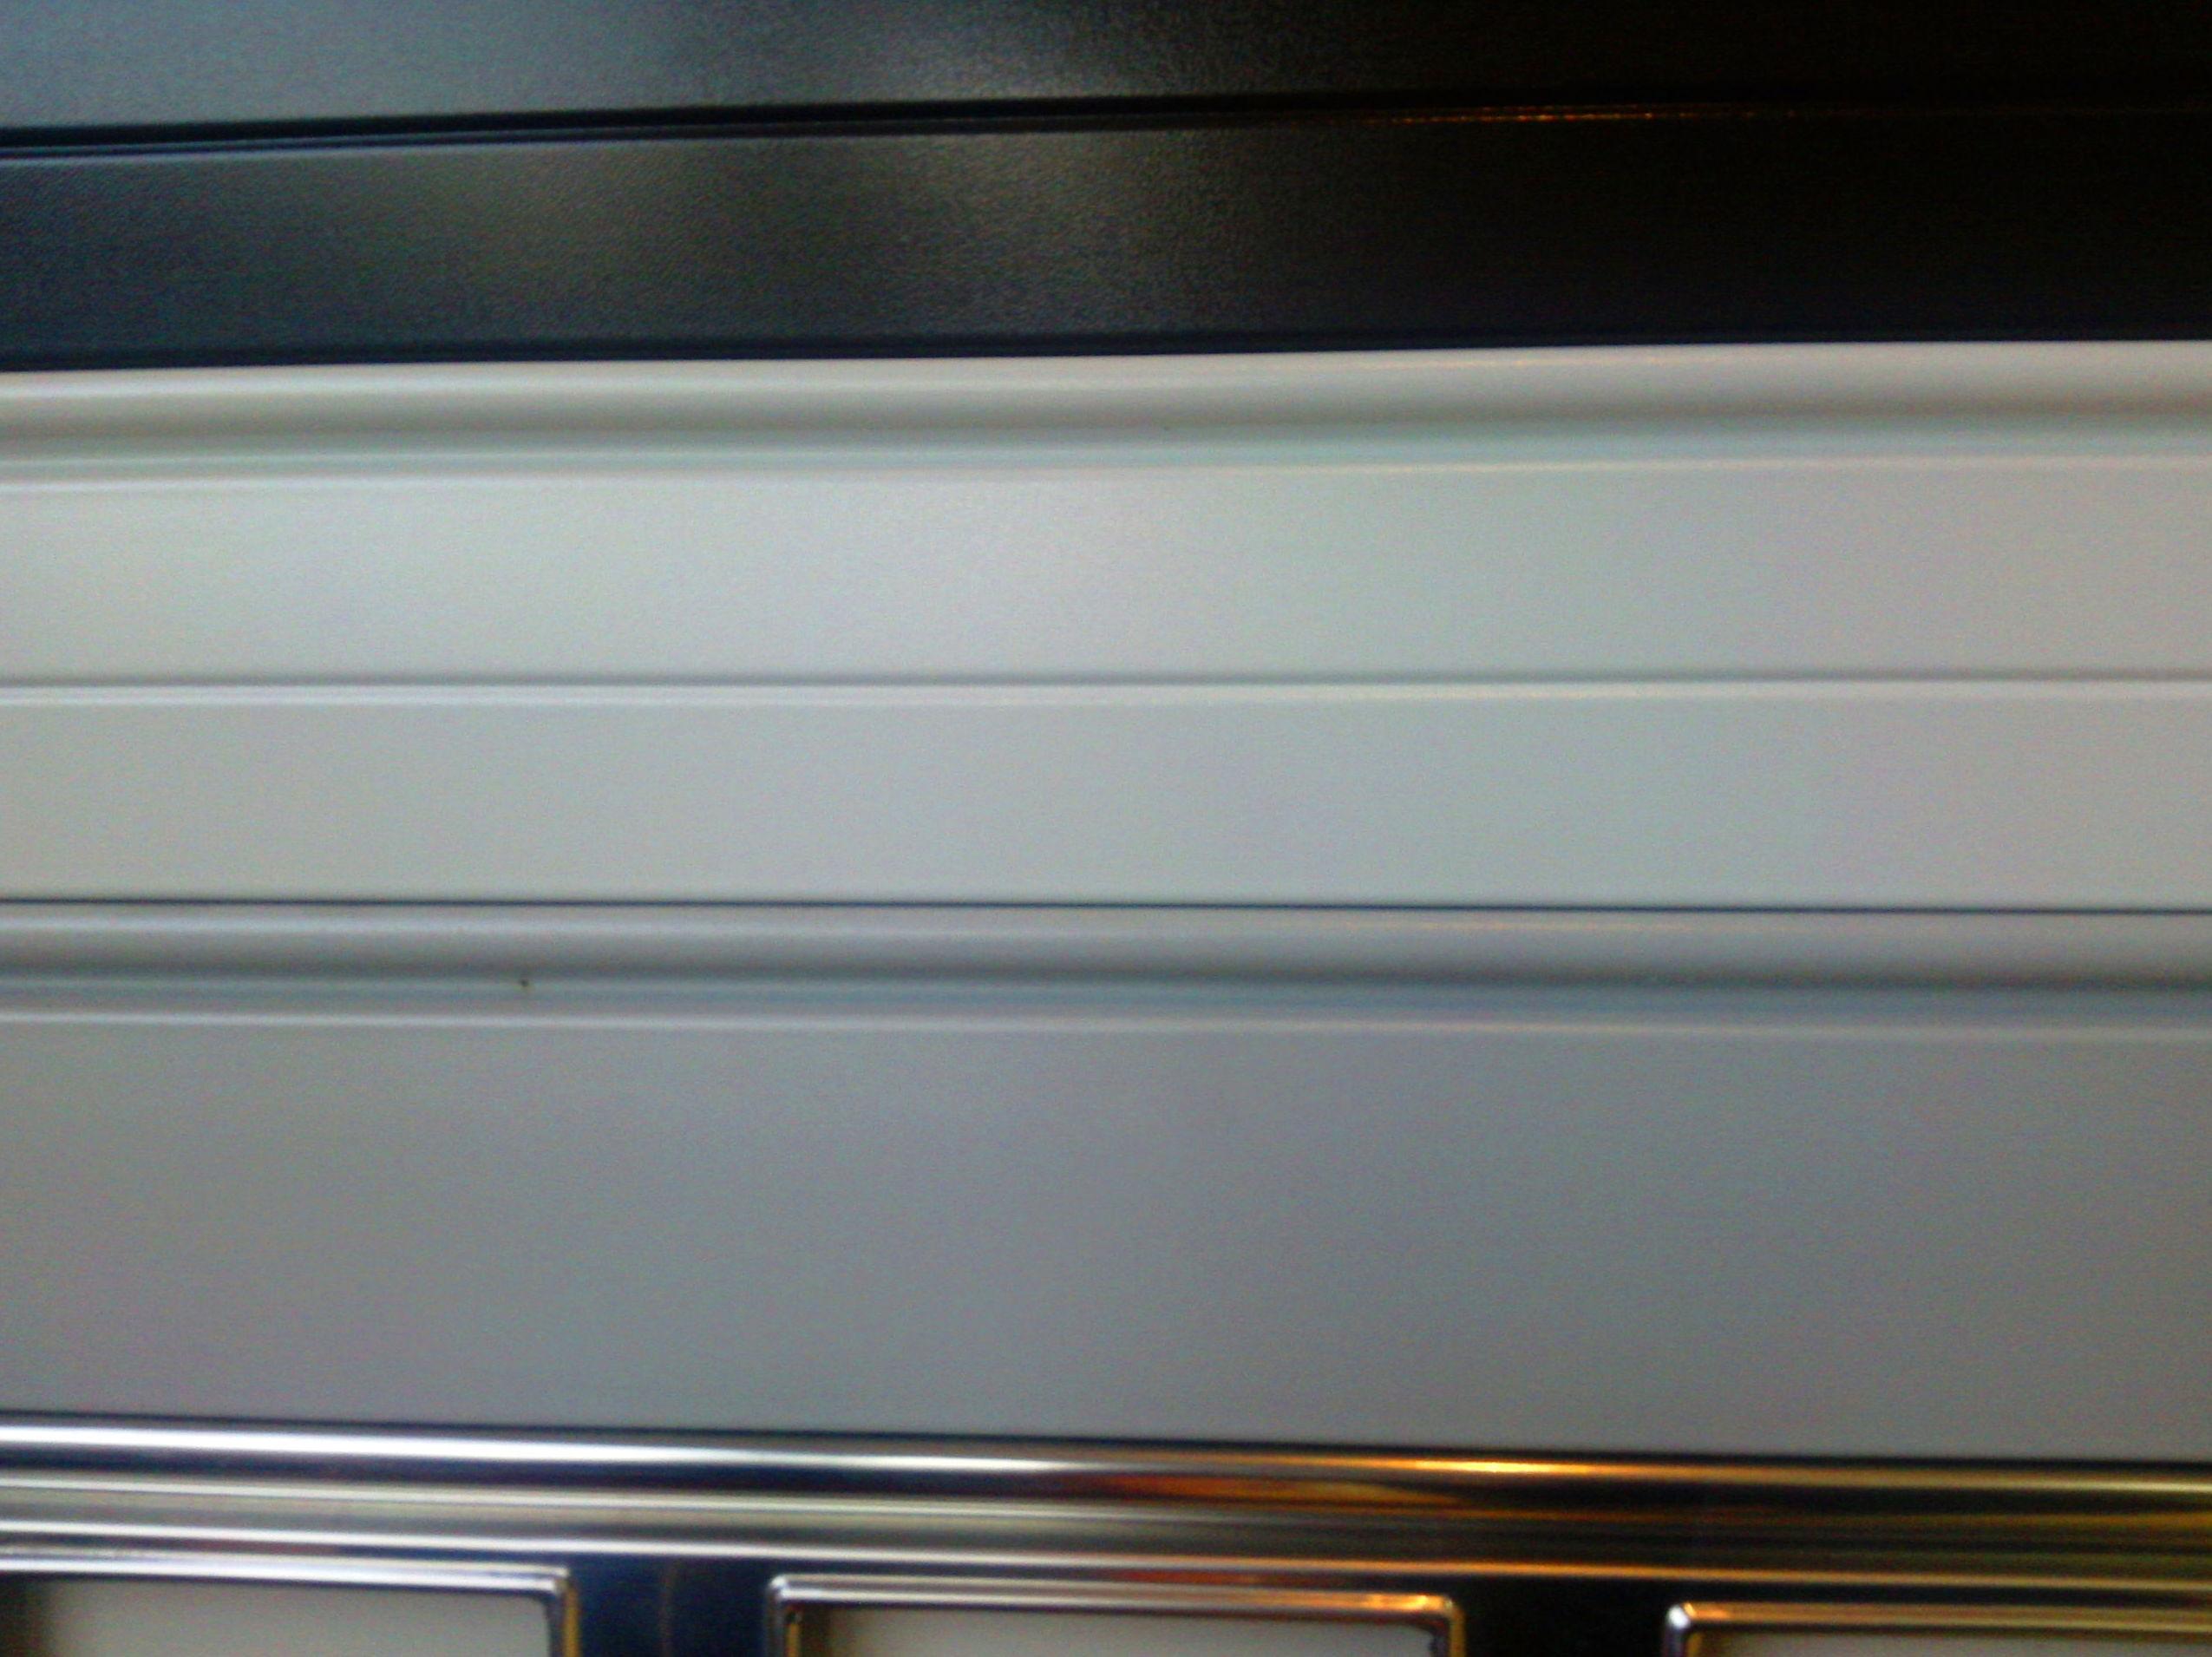 Lamas de puerta enrollable metálicas